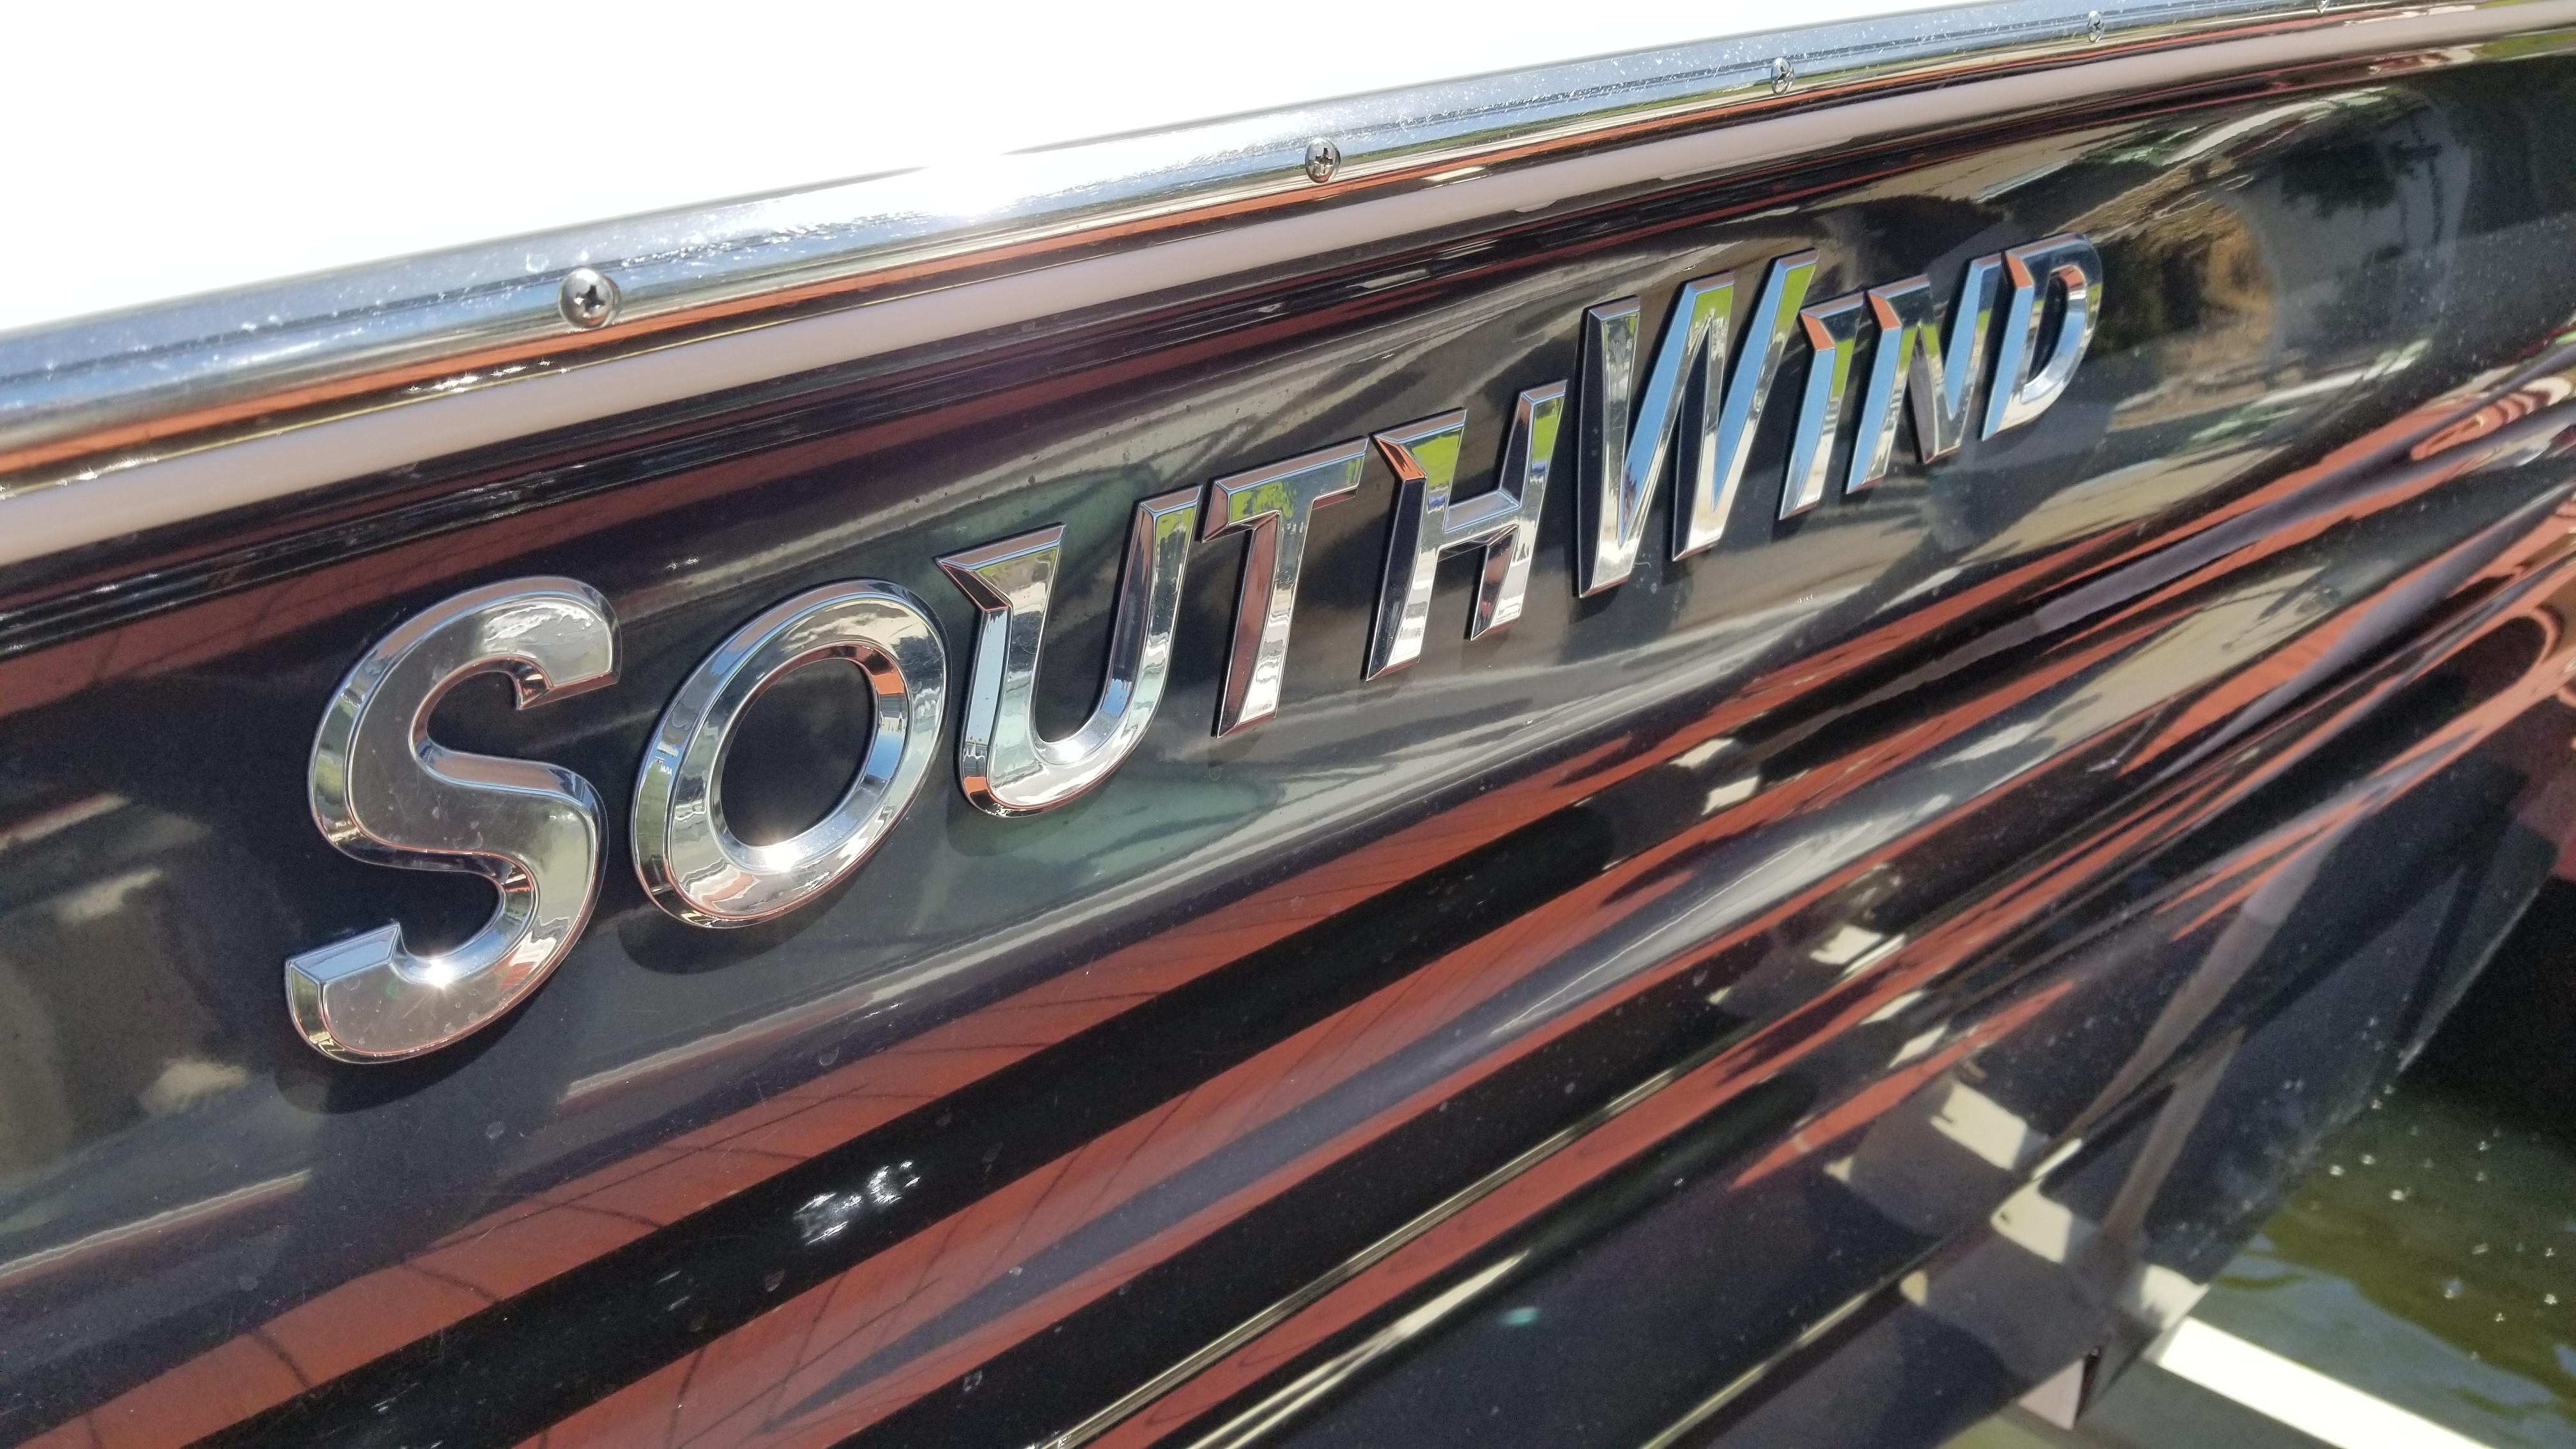 SouthWind SD 2200 20180321_143937.jpg